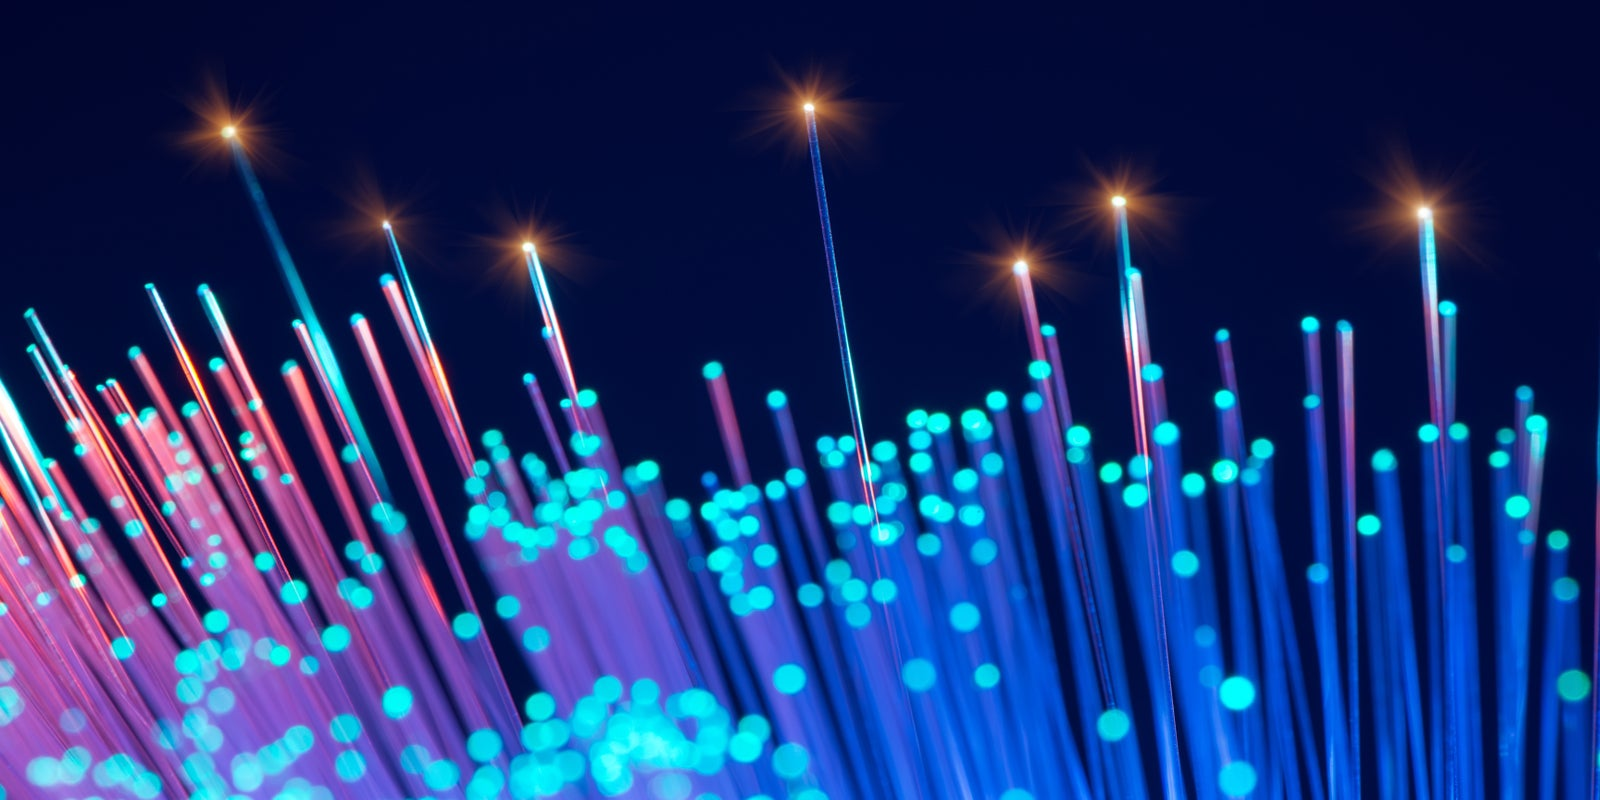 Physicists Smash Quantum Teleportation Record With 60-Mile Fibre Jump